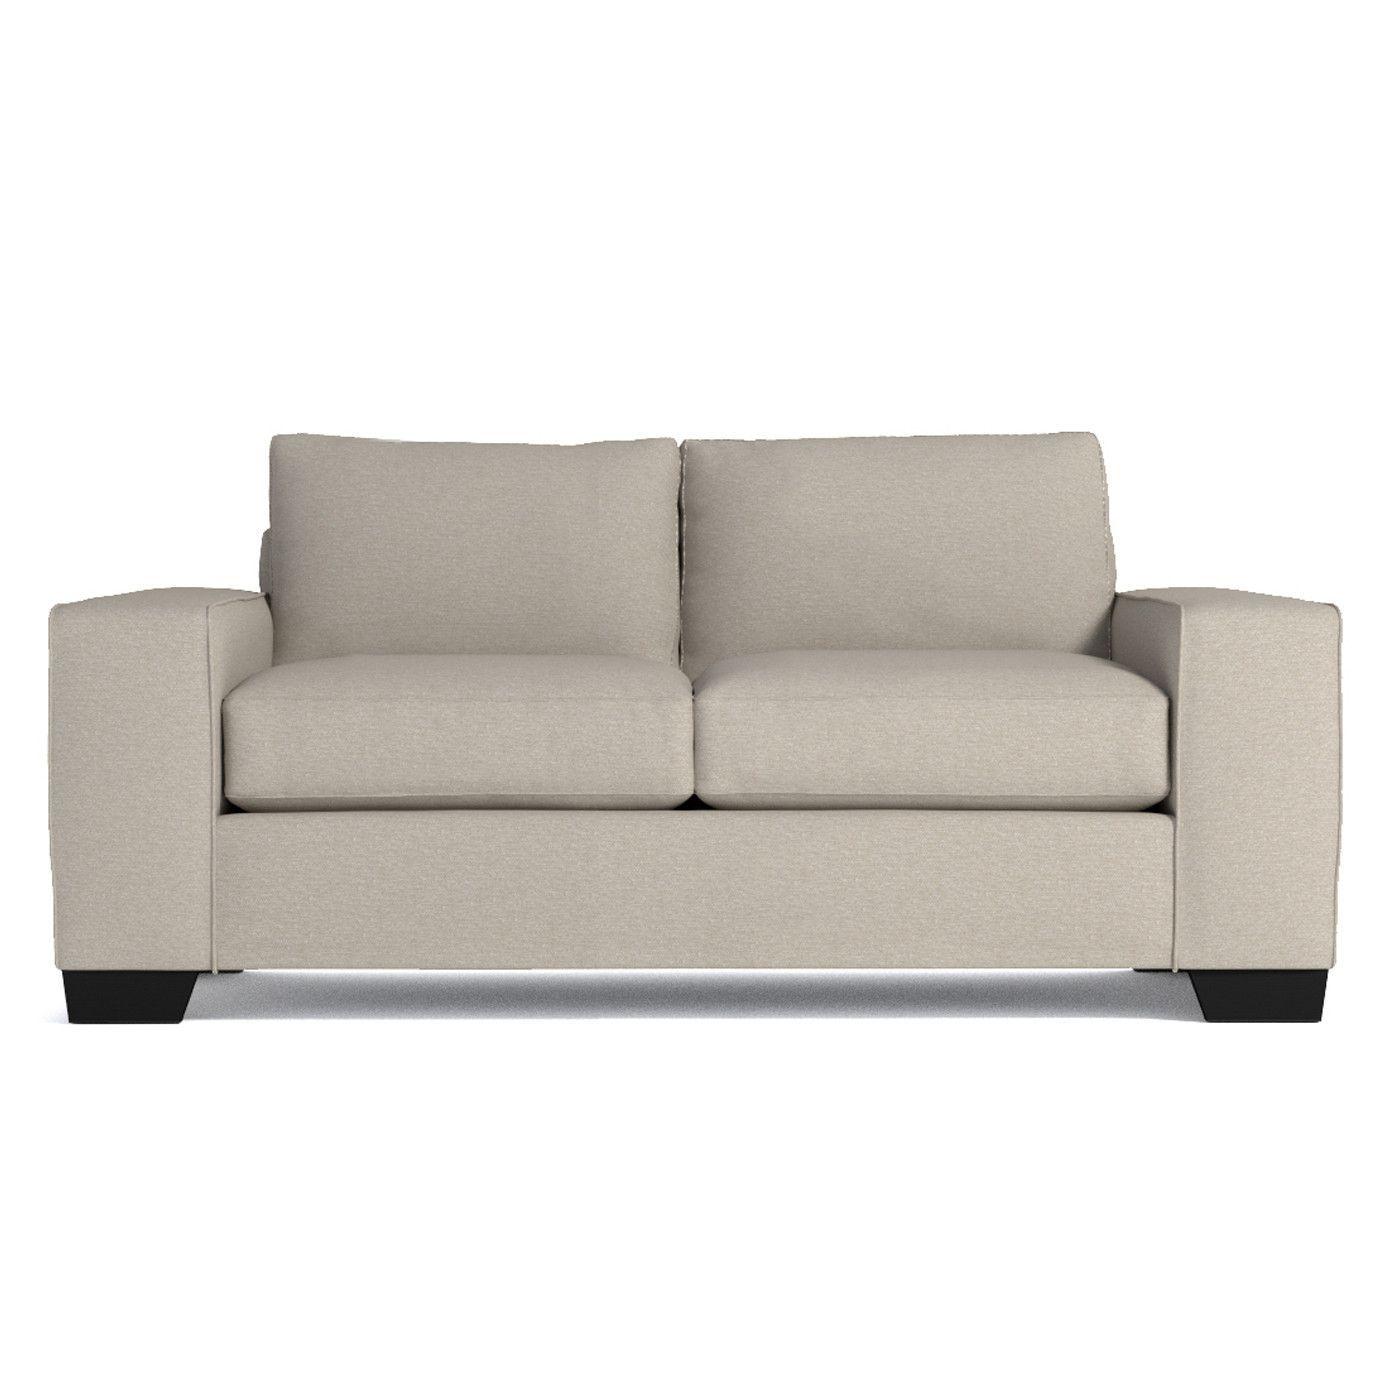 Melrose Apartment Size Sleeper Sofa